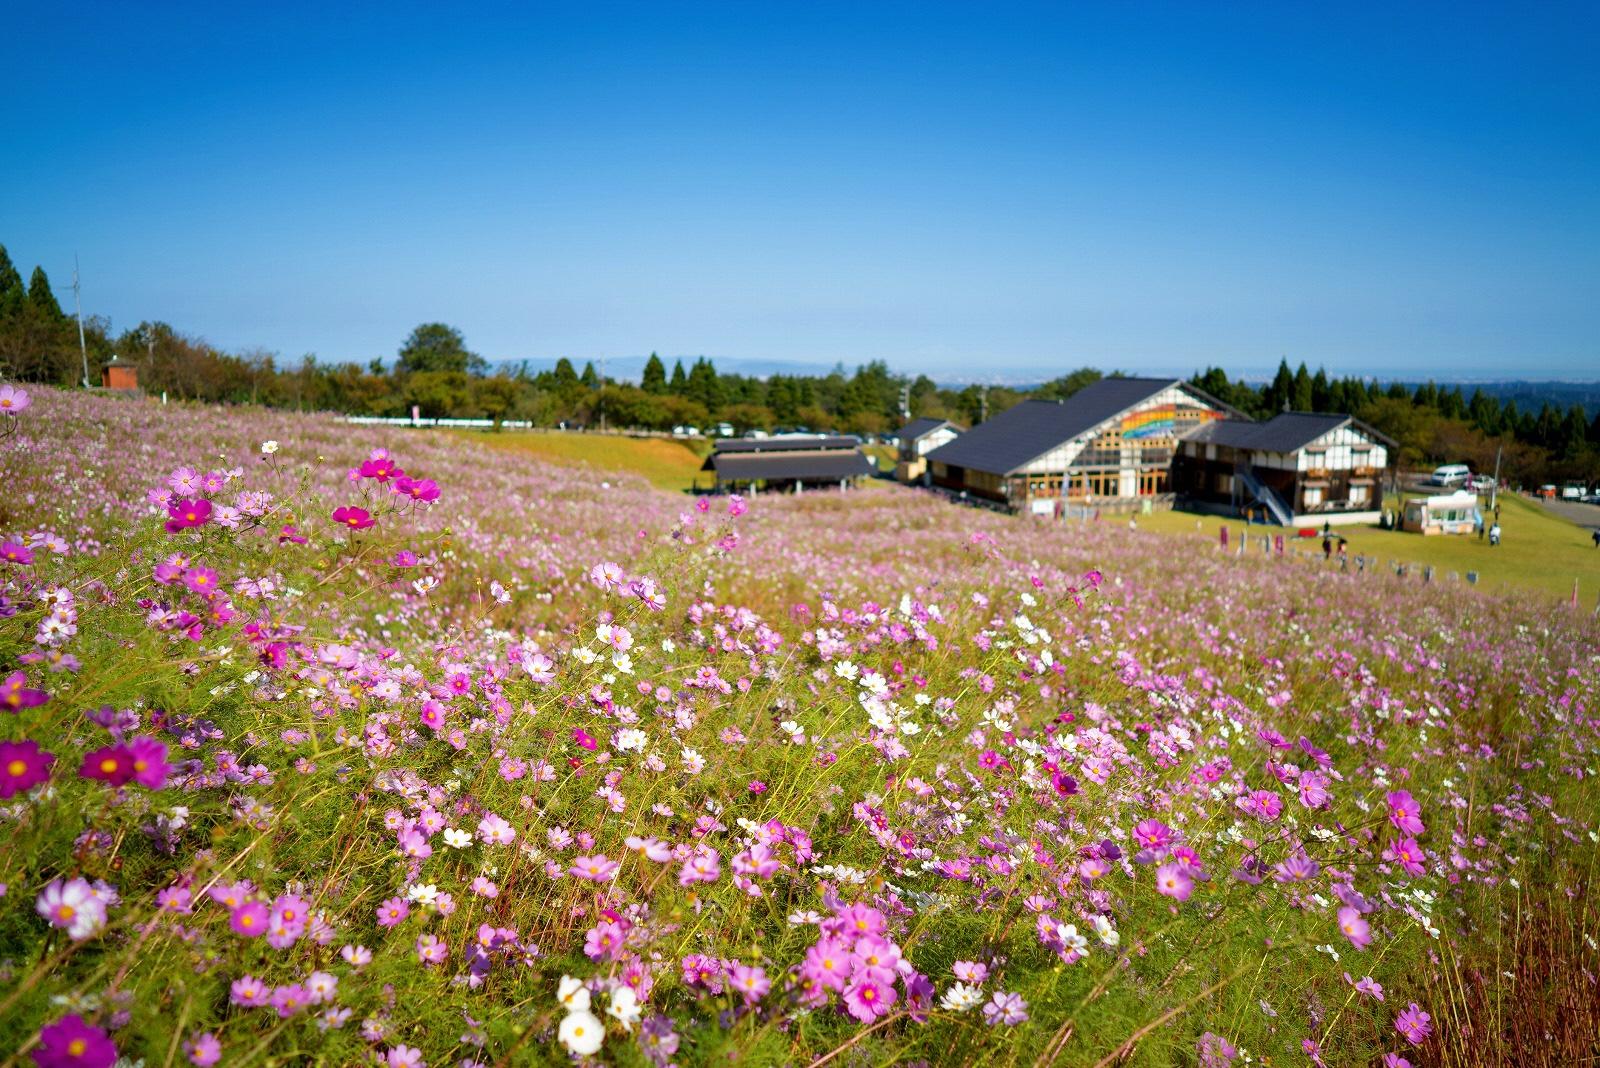 Strolling through the Cosmos Flowers at Tonami Yumenotaira